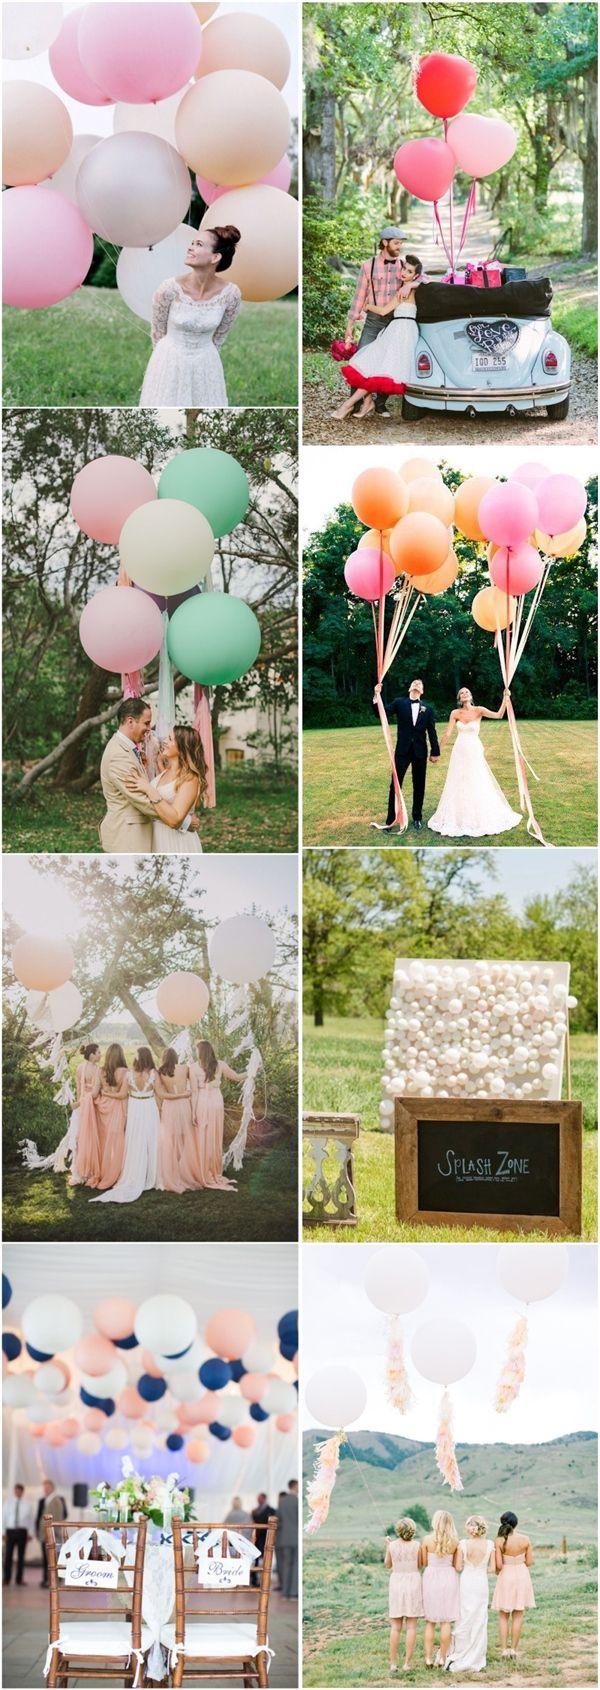 Balloons for wedding - Balloons For Wedding 44